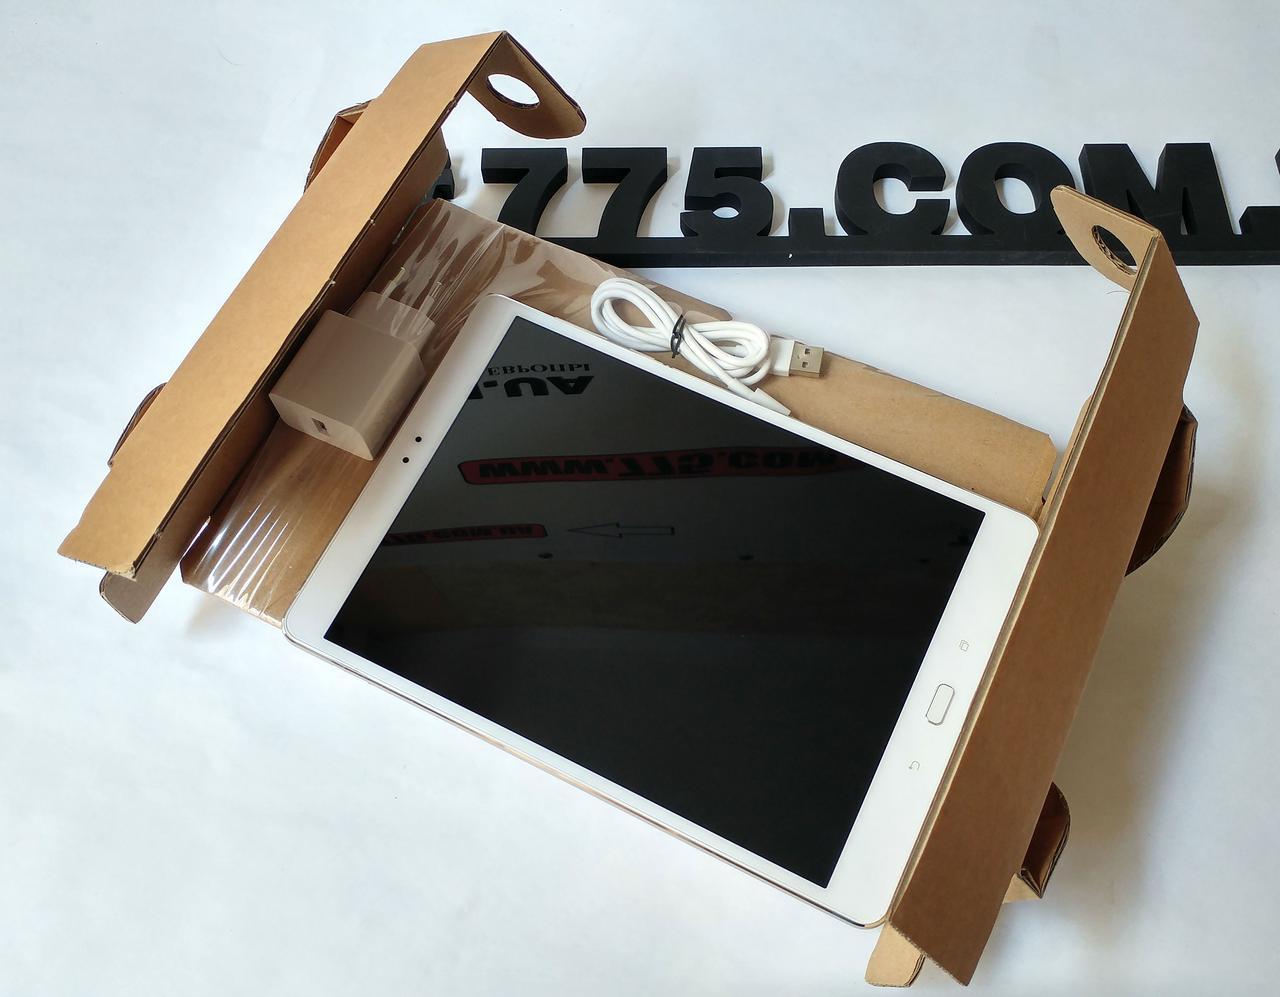 Планшет Asus ZenPad 3S 10, IPS (2048x1536), 4/64Gb Silver, GPS, ГЛОНАСС, оригинал, гарантия 6 мес!